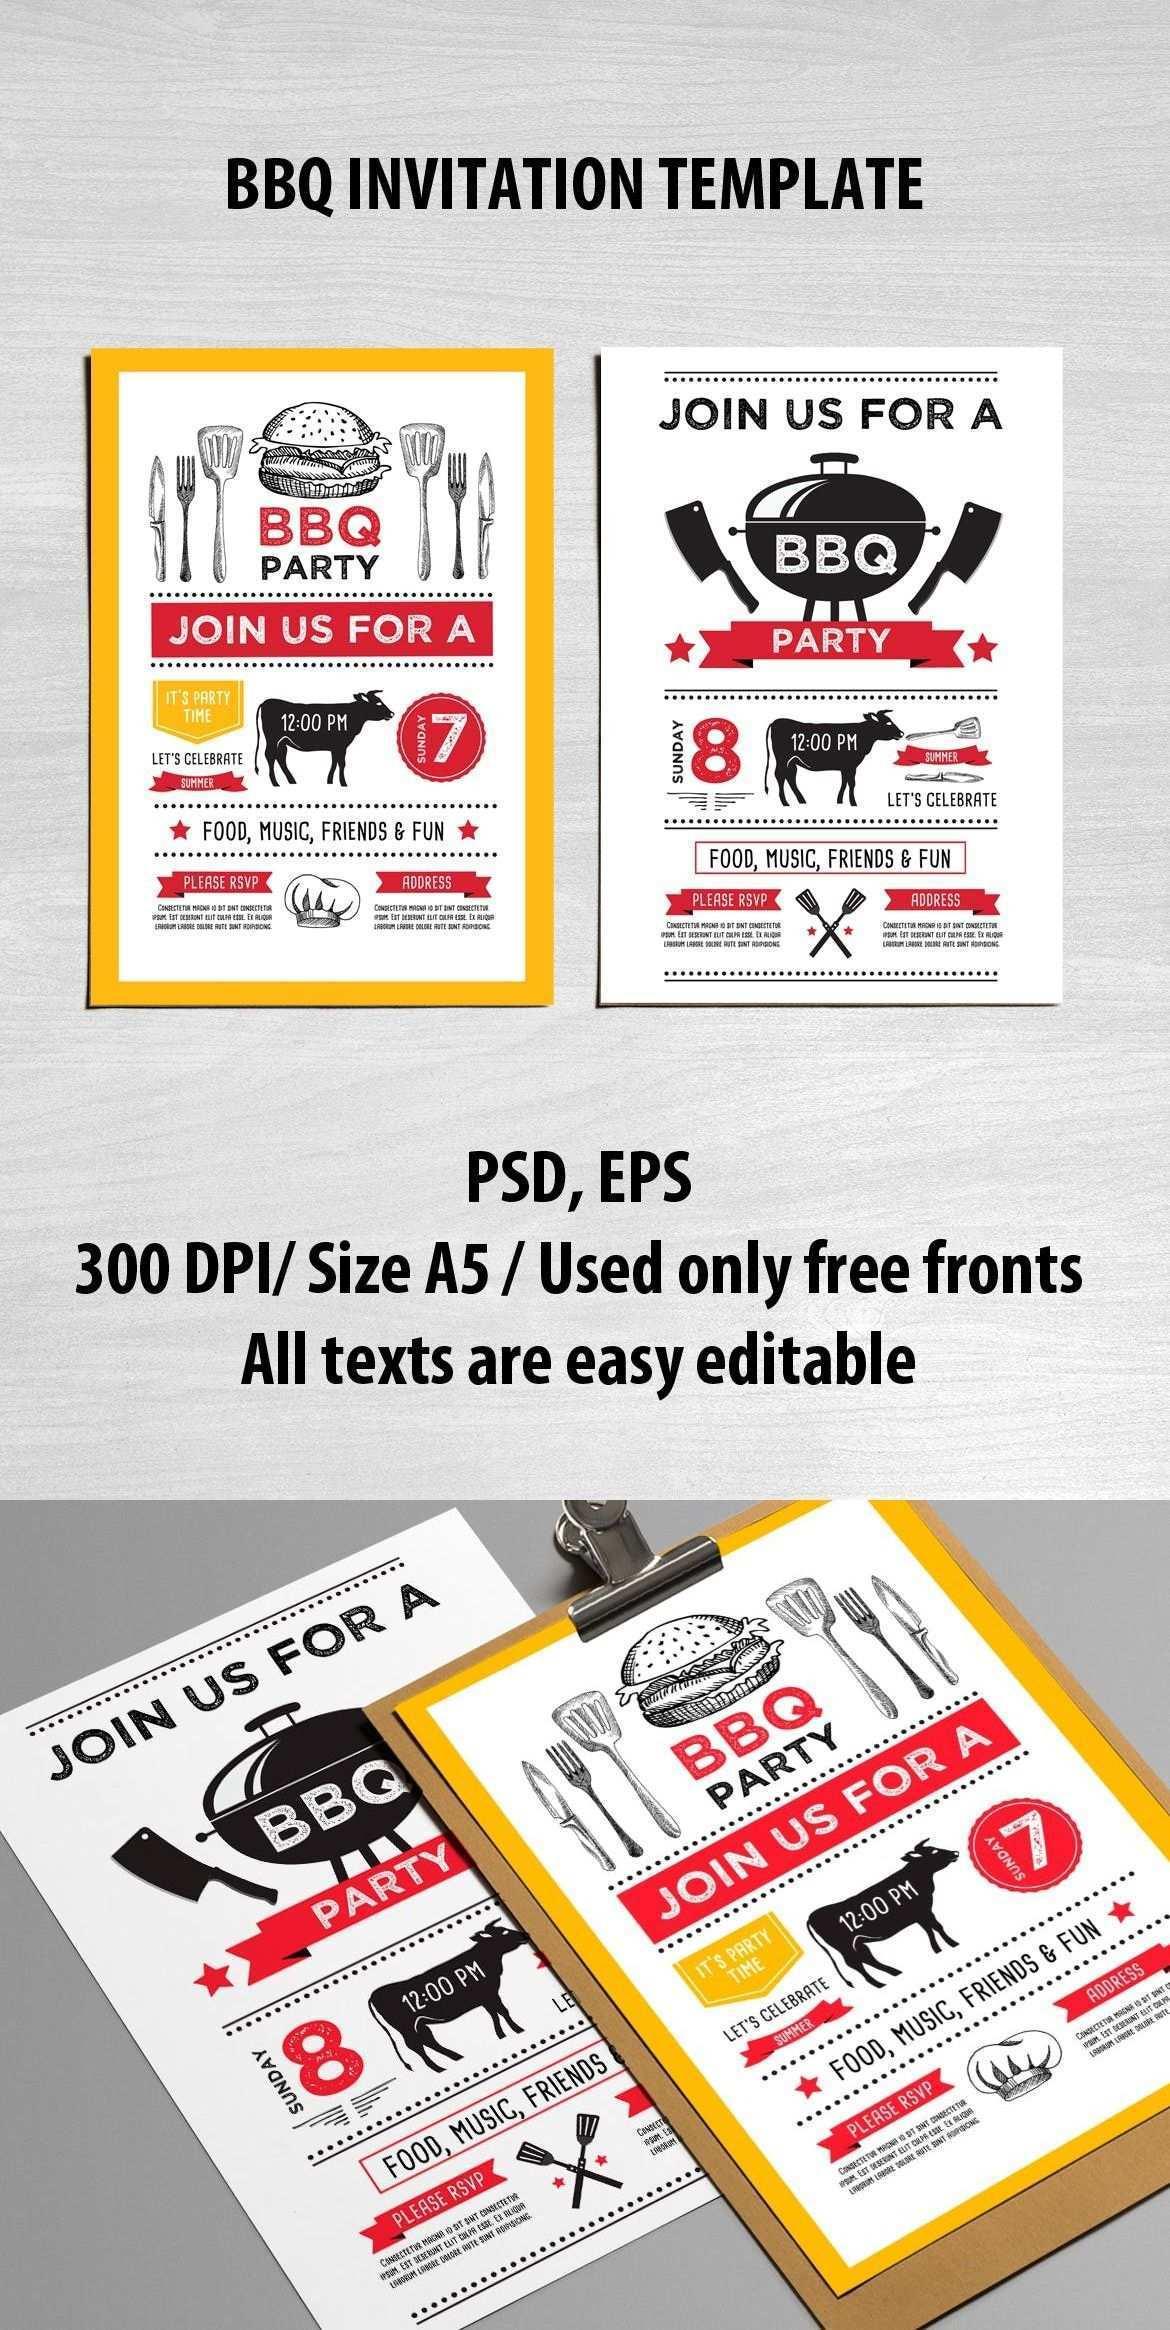 97 Online Adobe Illustrator Templates Flyer Formating by Adobe Illustrator Templates Flyer